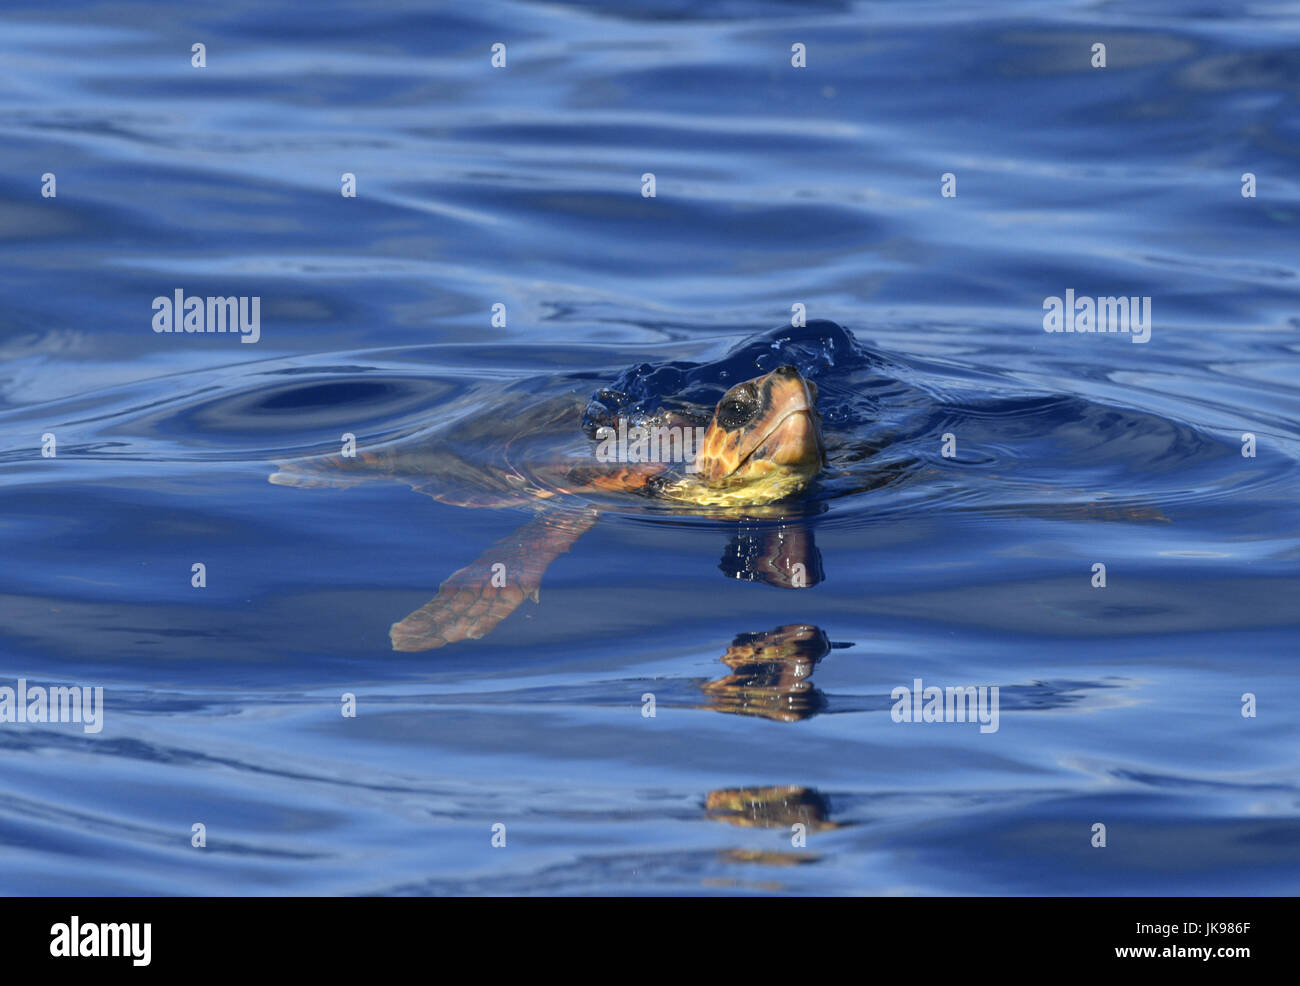 Tortuga boba - Caretta caretta Imagen De Stock